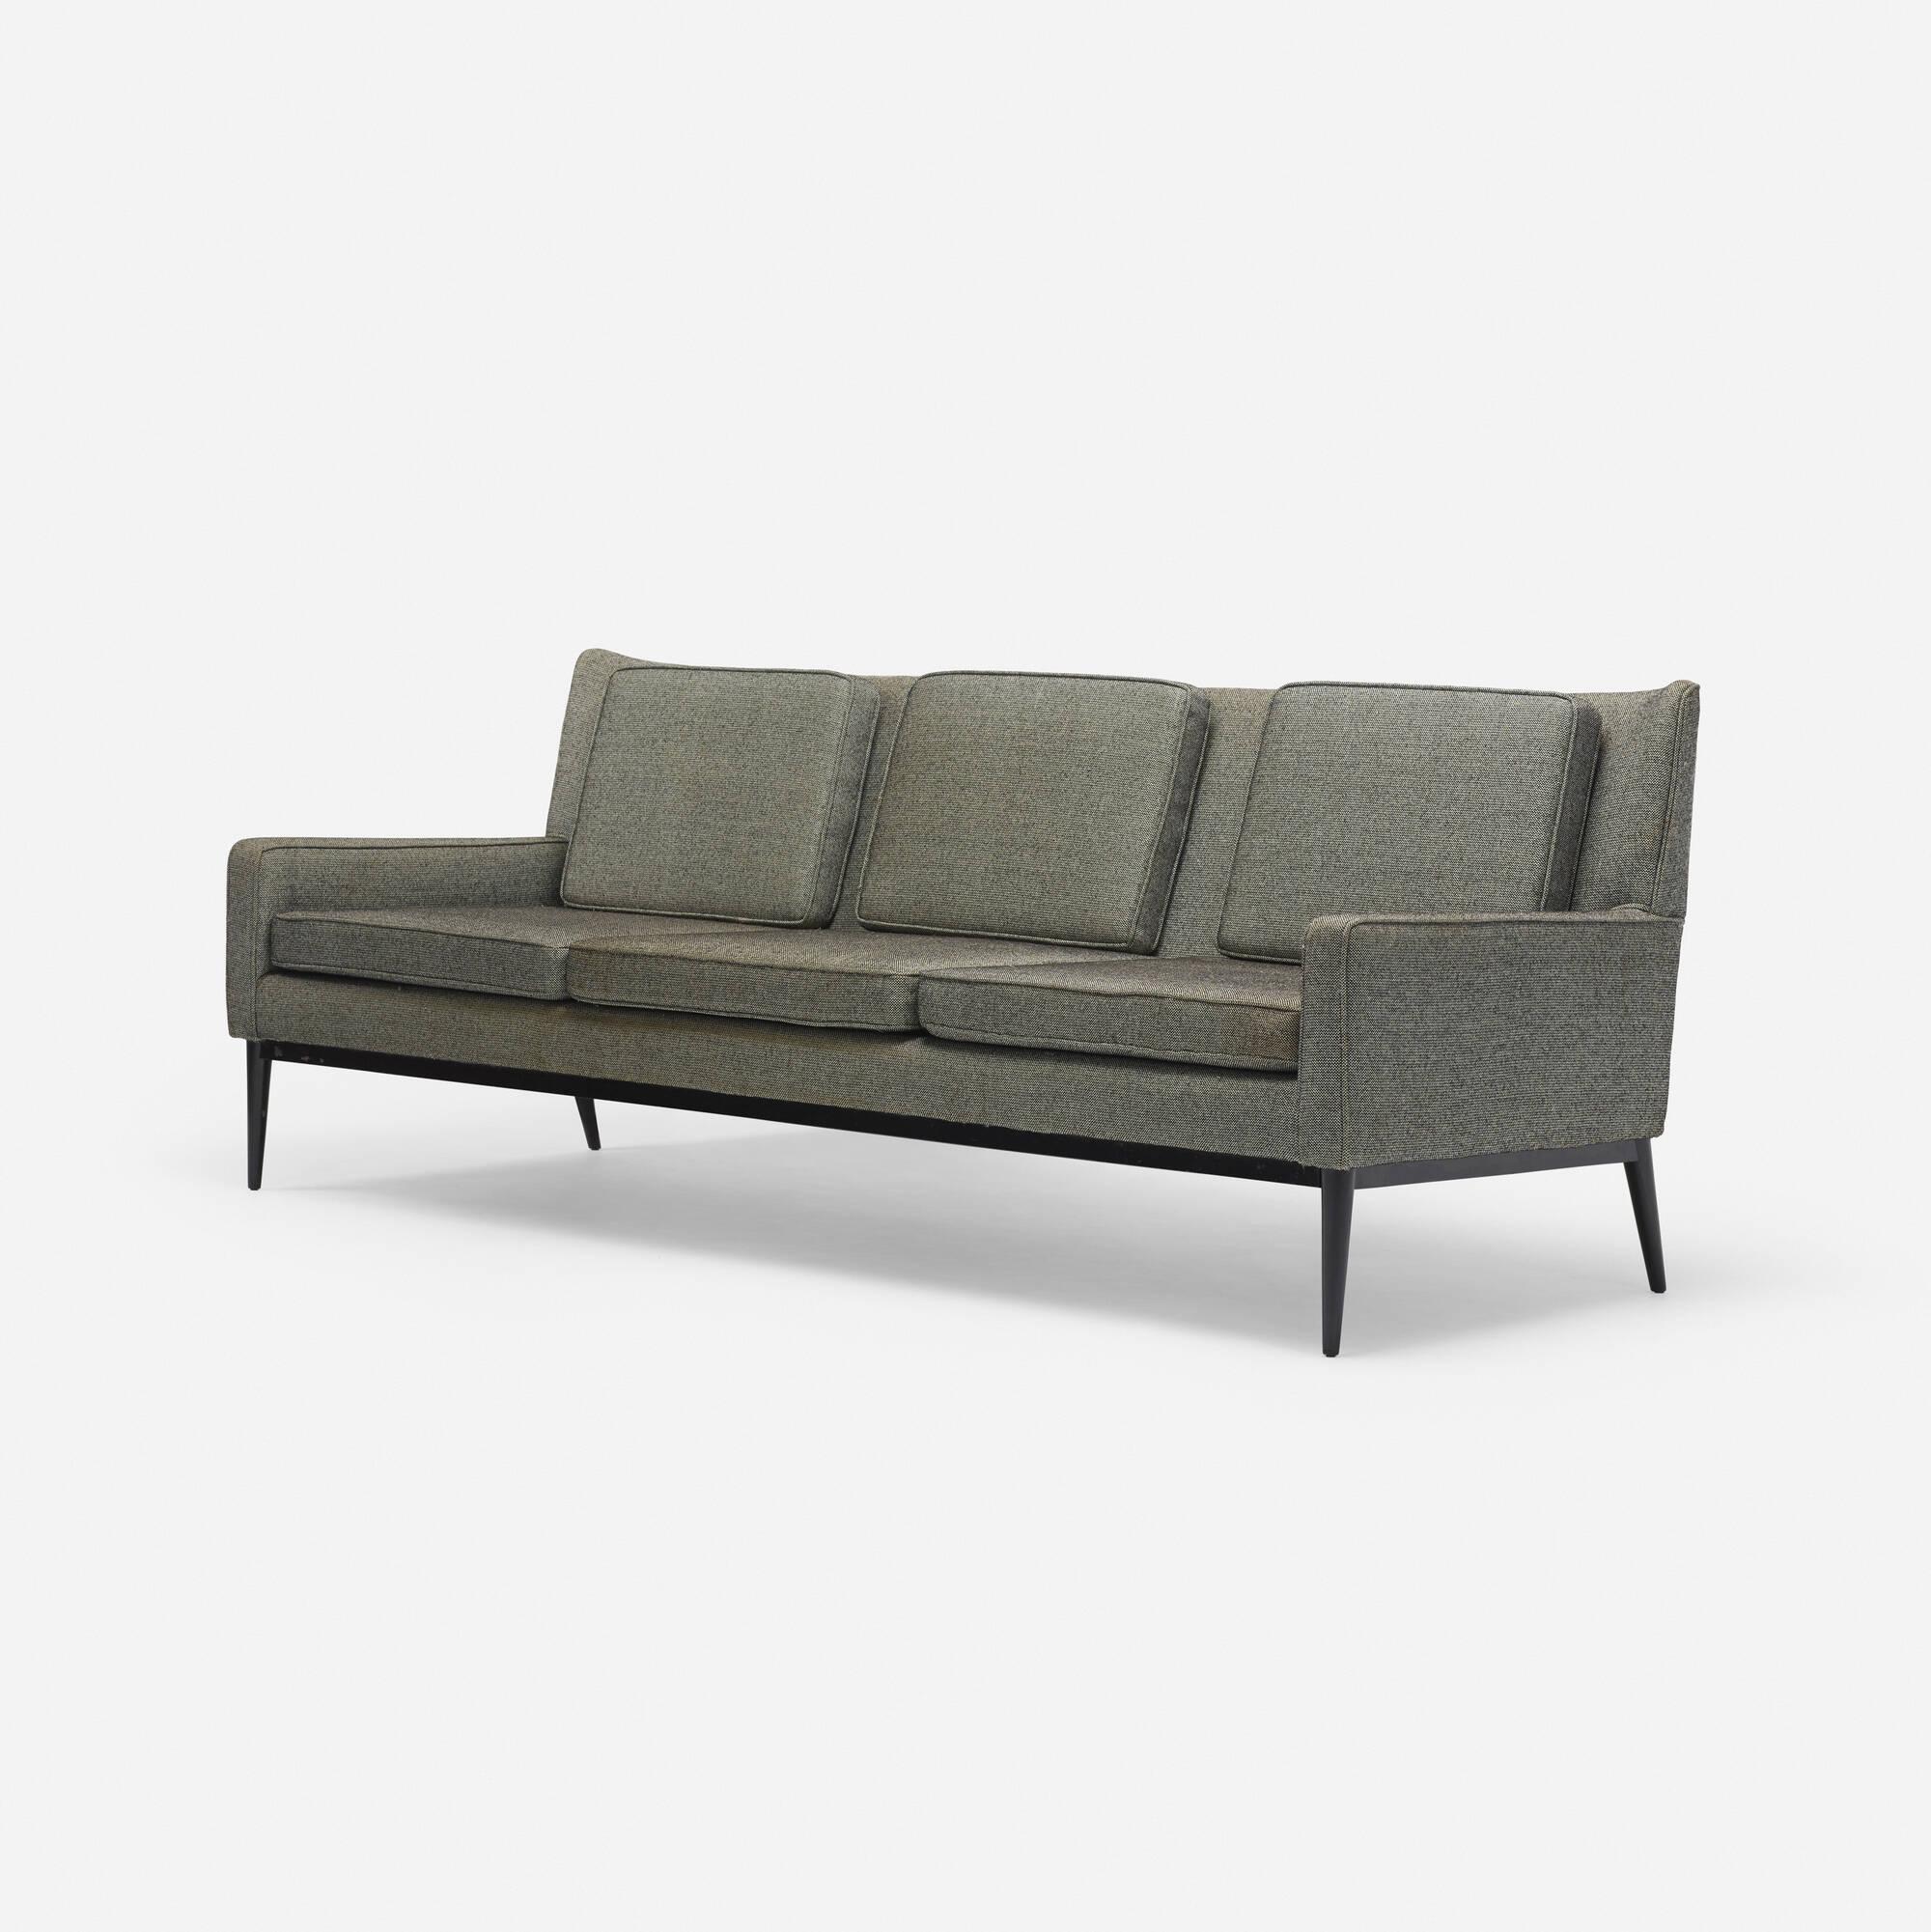 557: Paul McCobb / sofa (1 of 3)